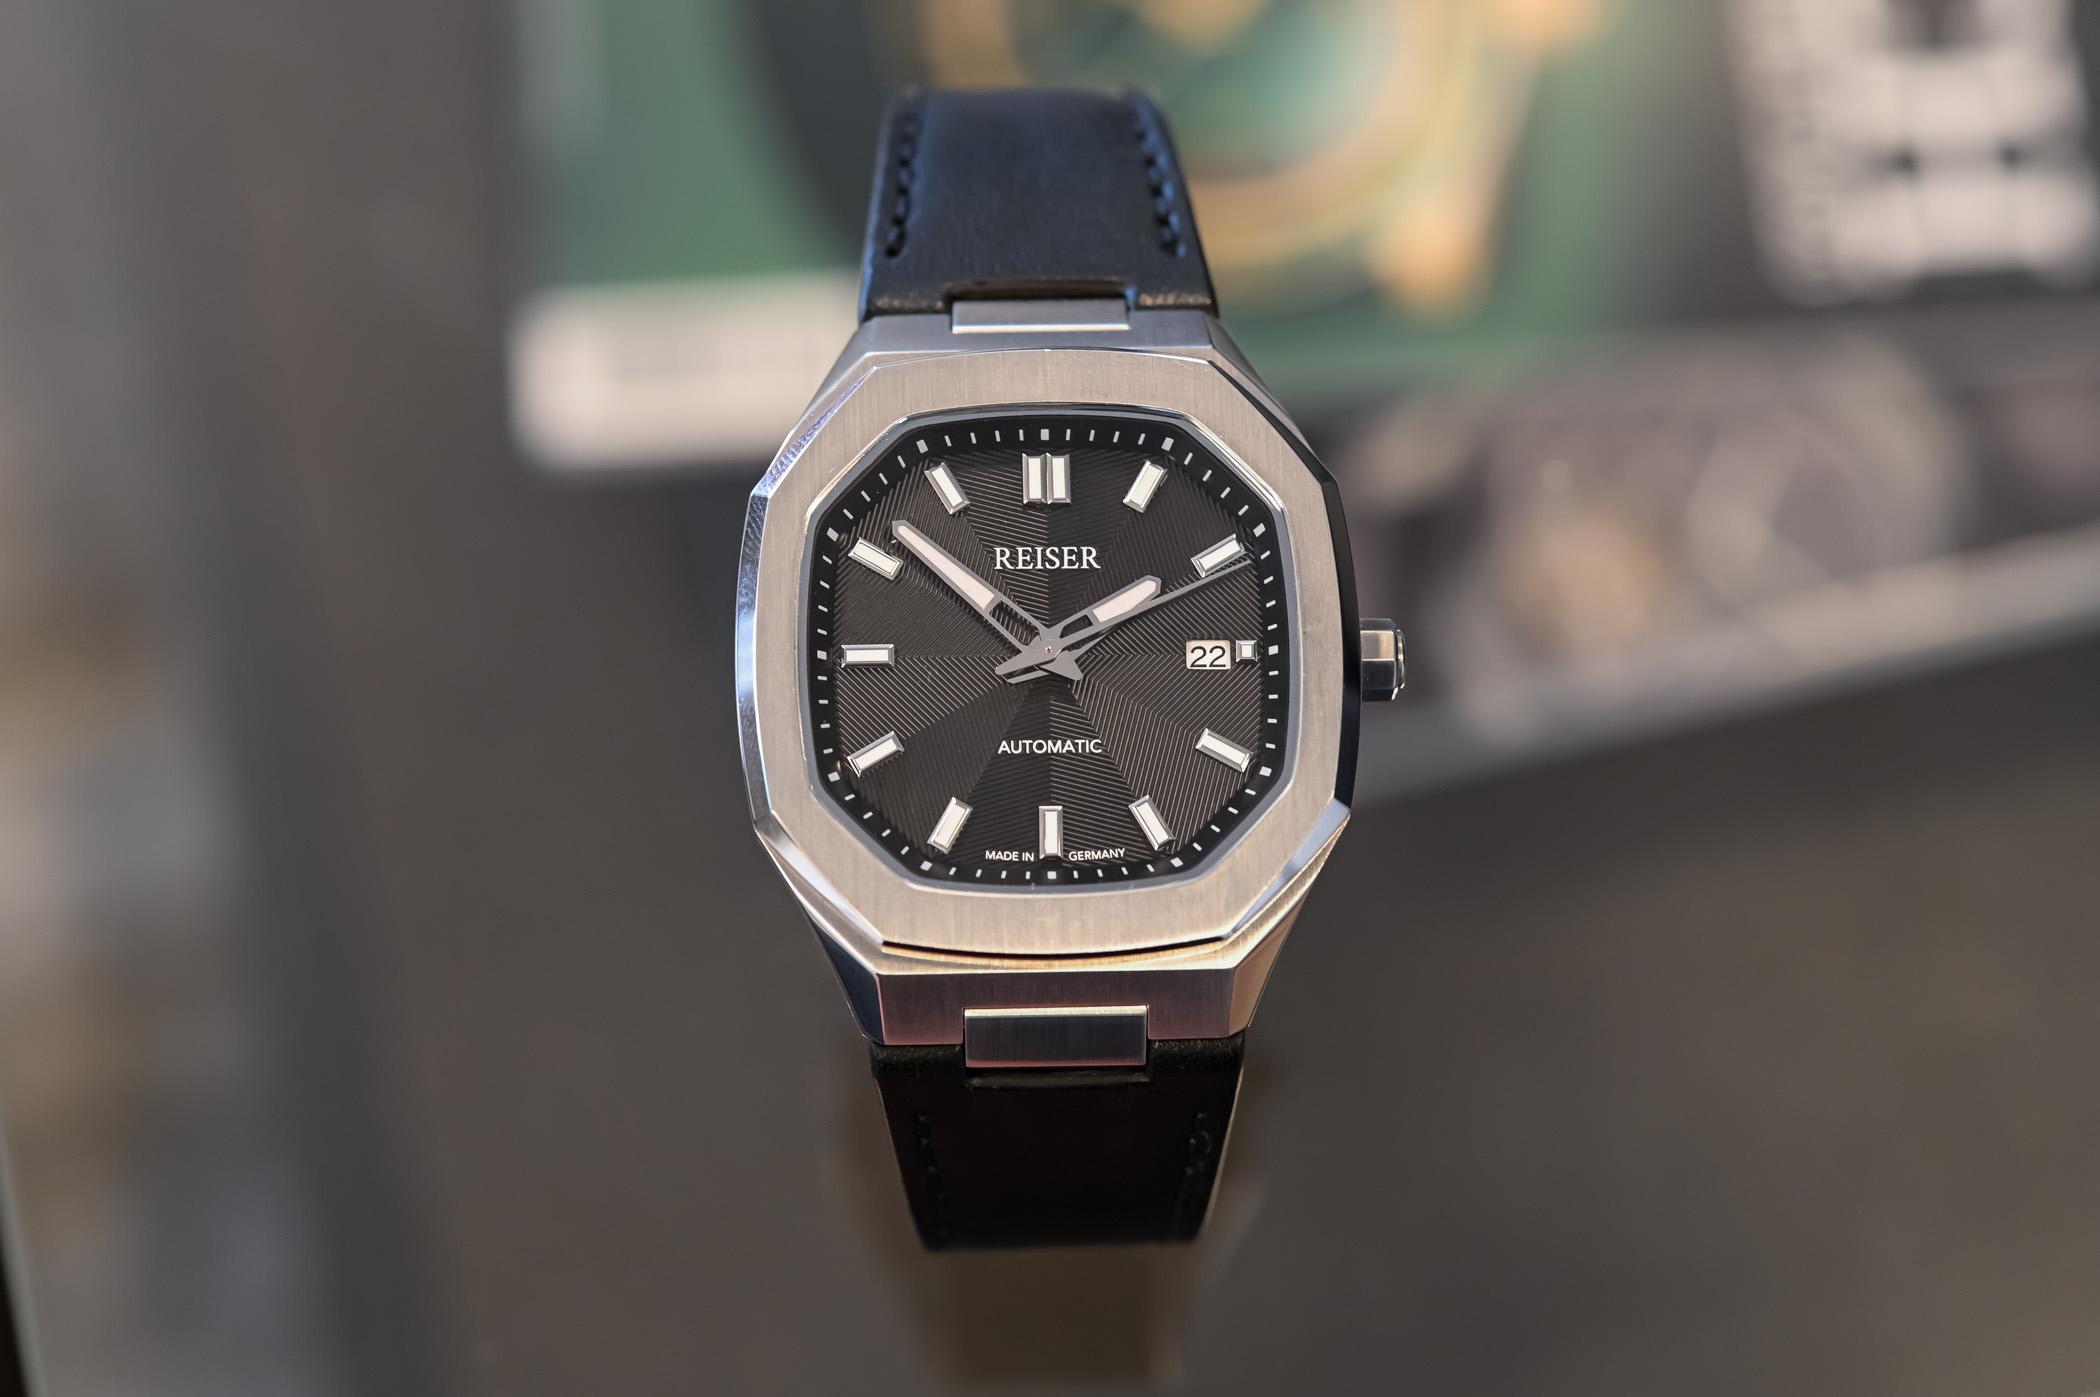 Reiser Alpen Date Watch - value proposition hands-on - 6